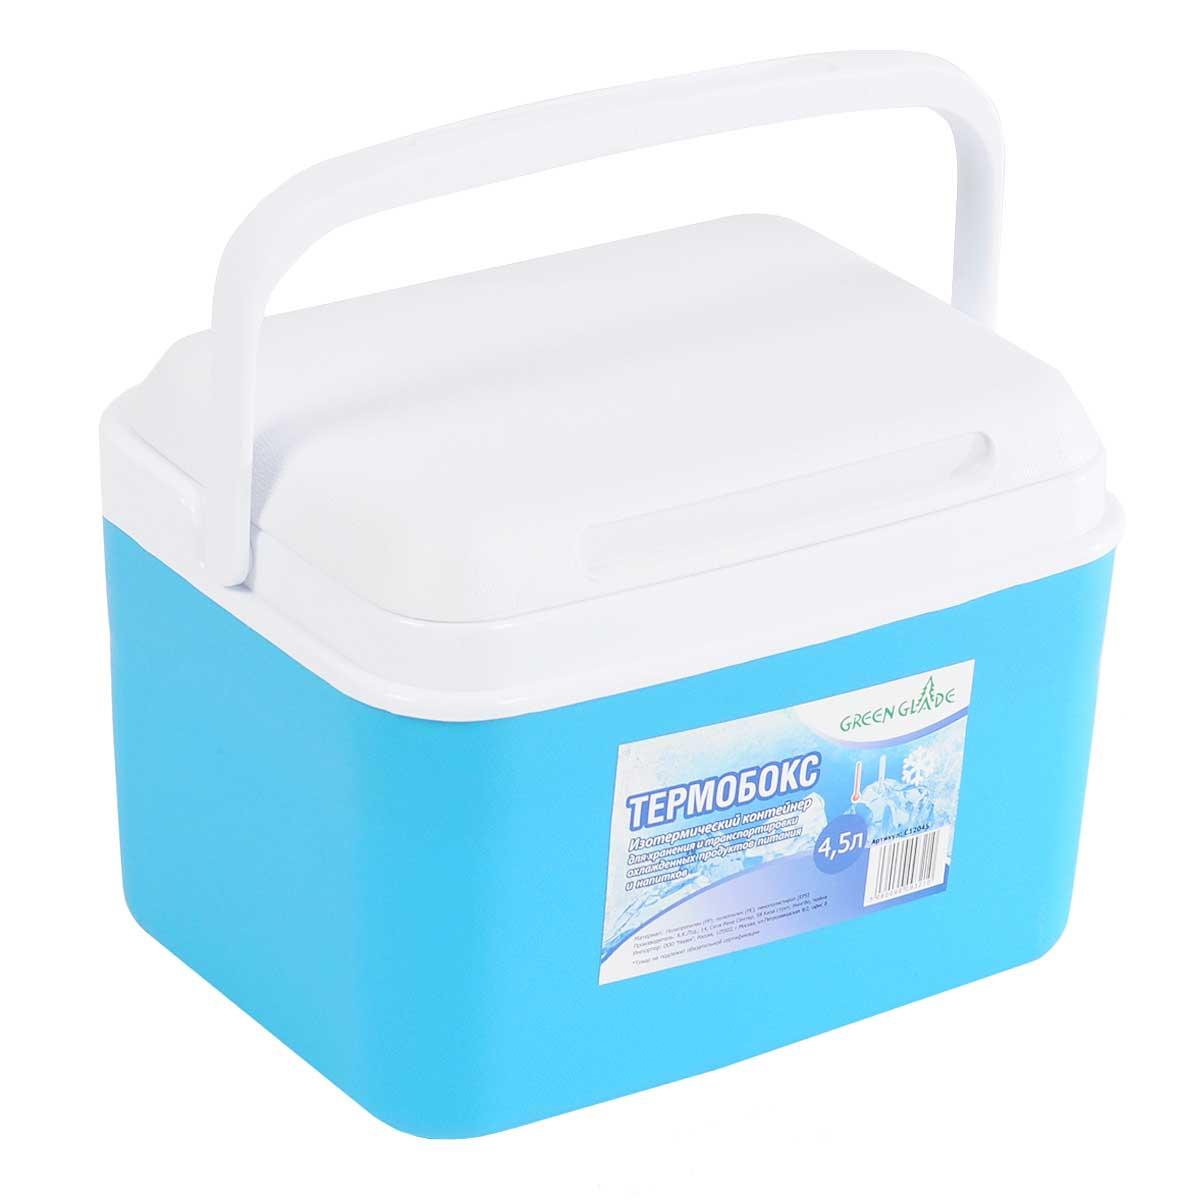 Контейнер изотермический Green Glade, цвет: голубой, 4,5 л аккумулятор холода green glade te150 150гр